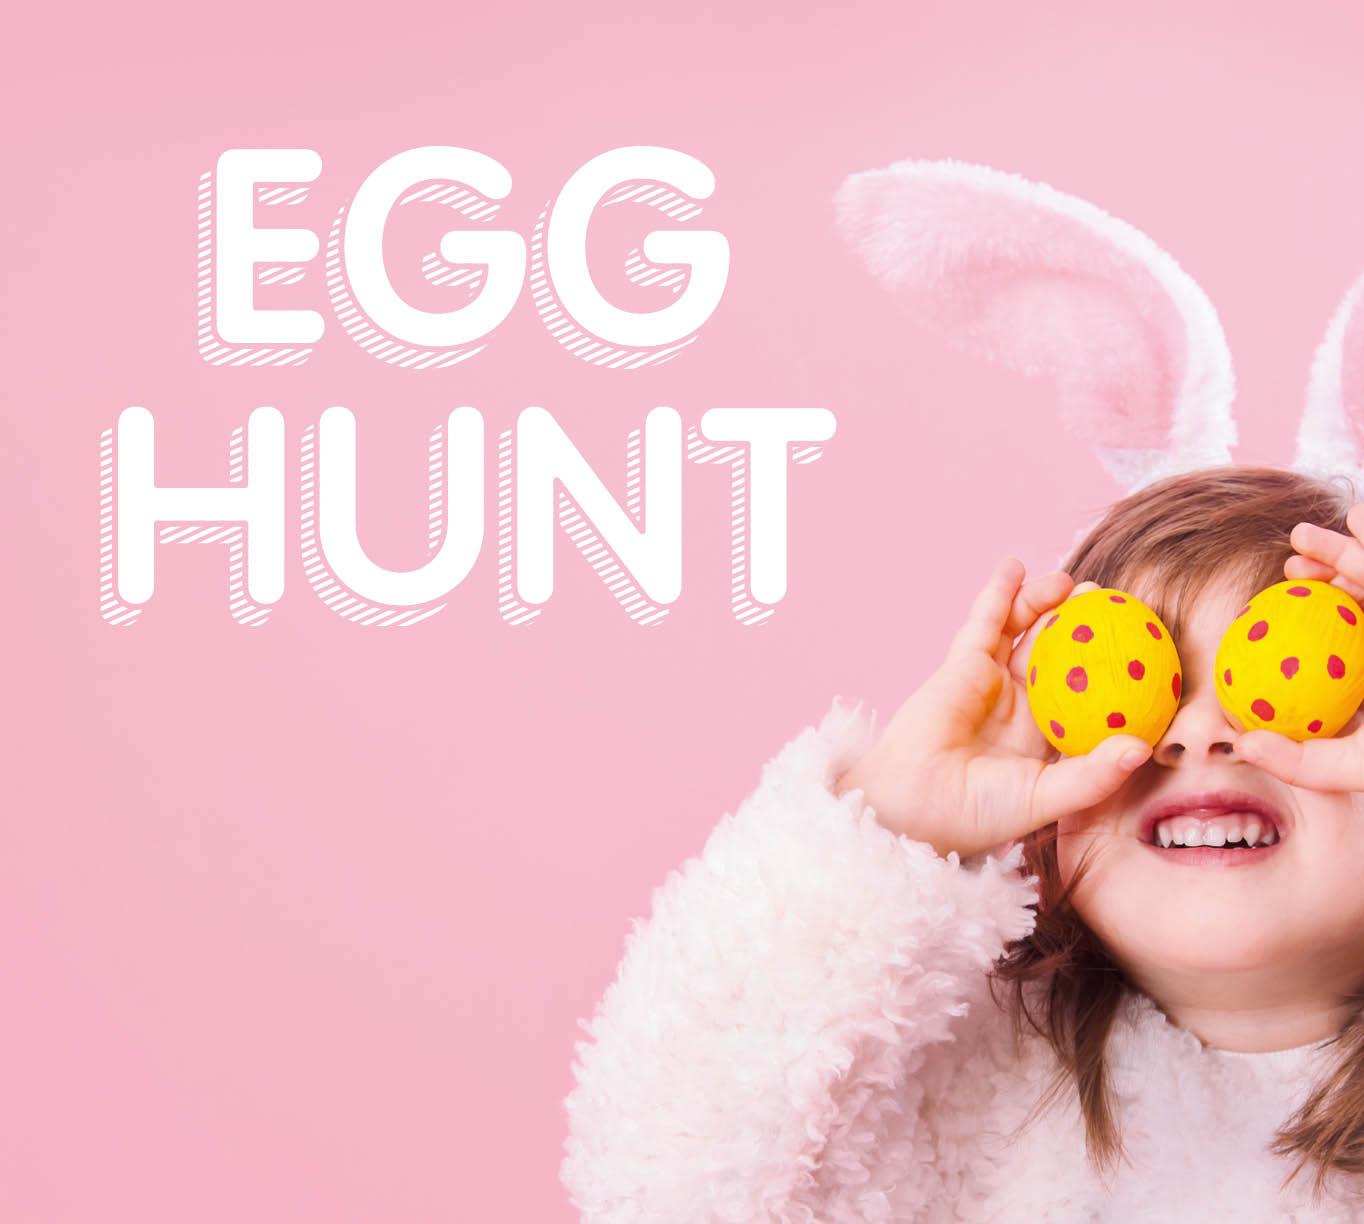 CH5427_Charter Hall_Easter Egg Hunt Creative_Web Tiles_682x612px